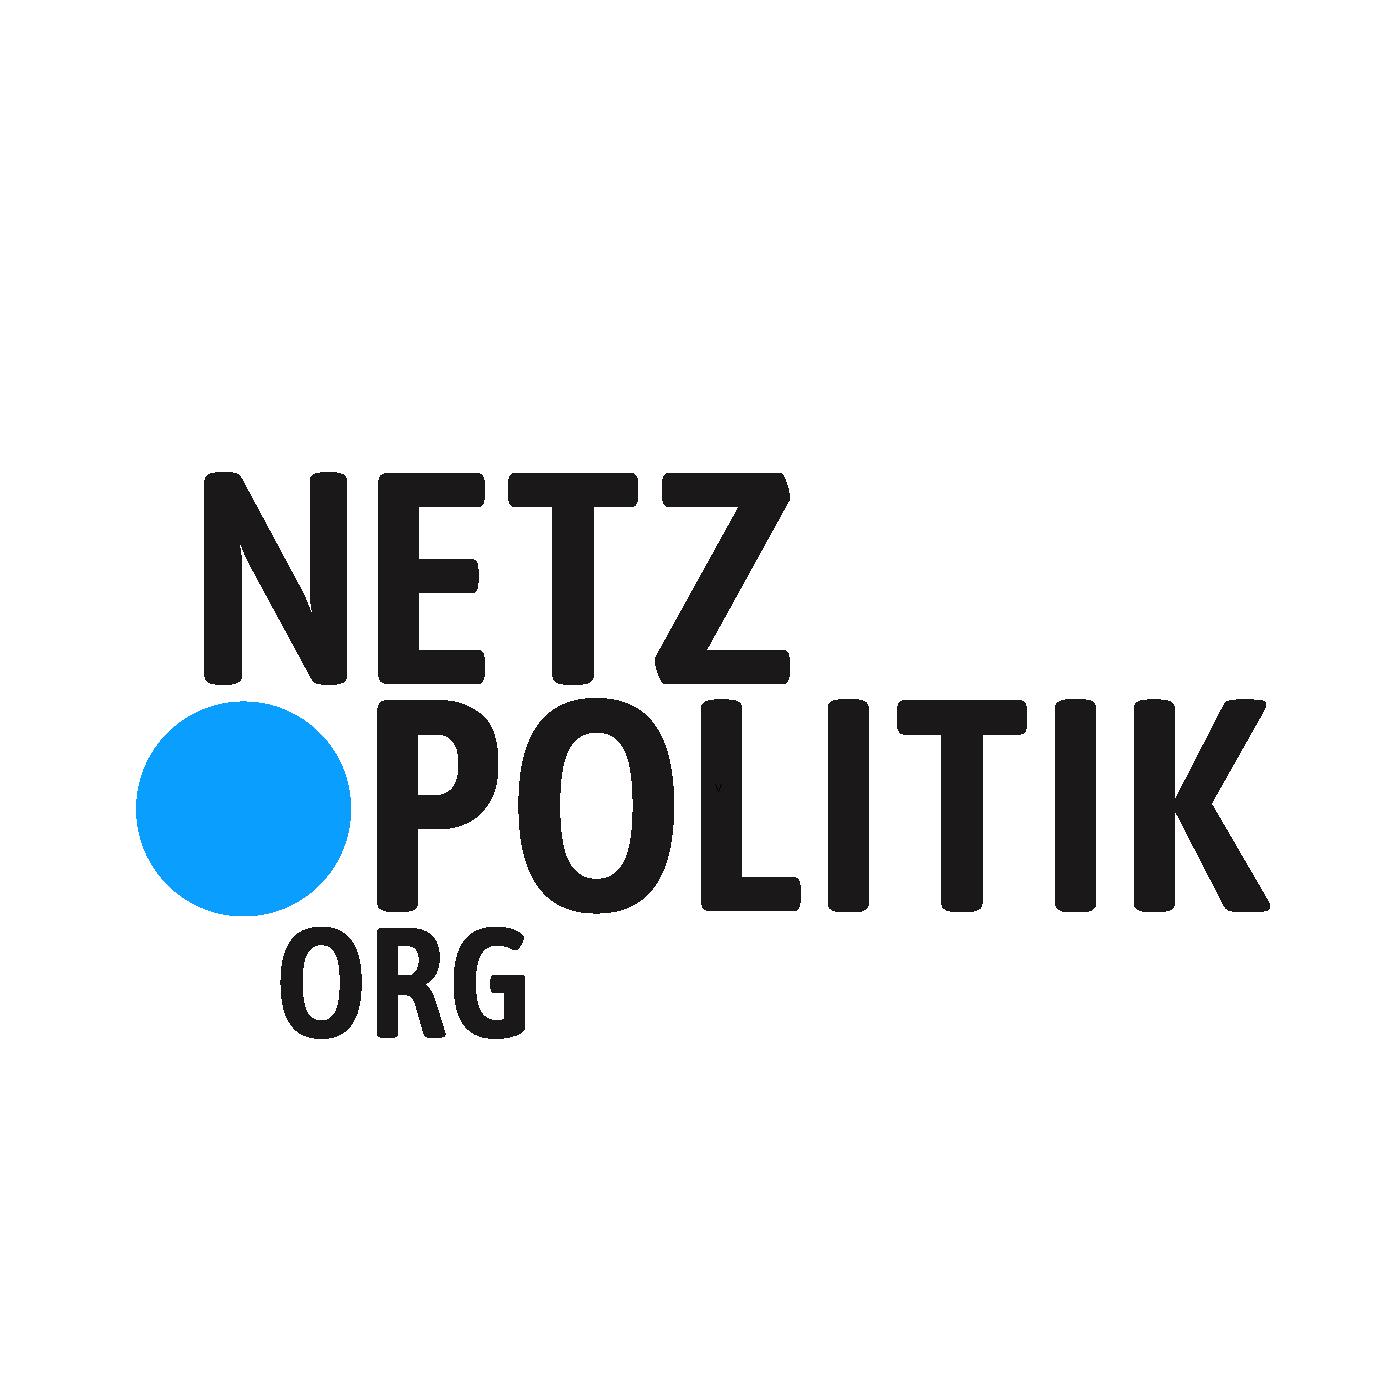 125x125 netzpolitik.org